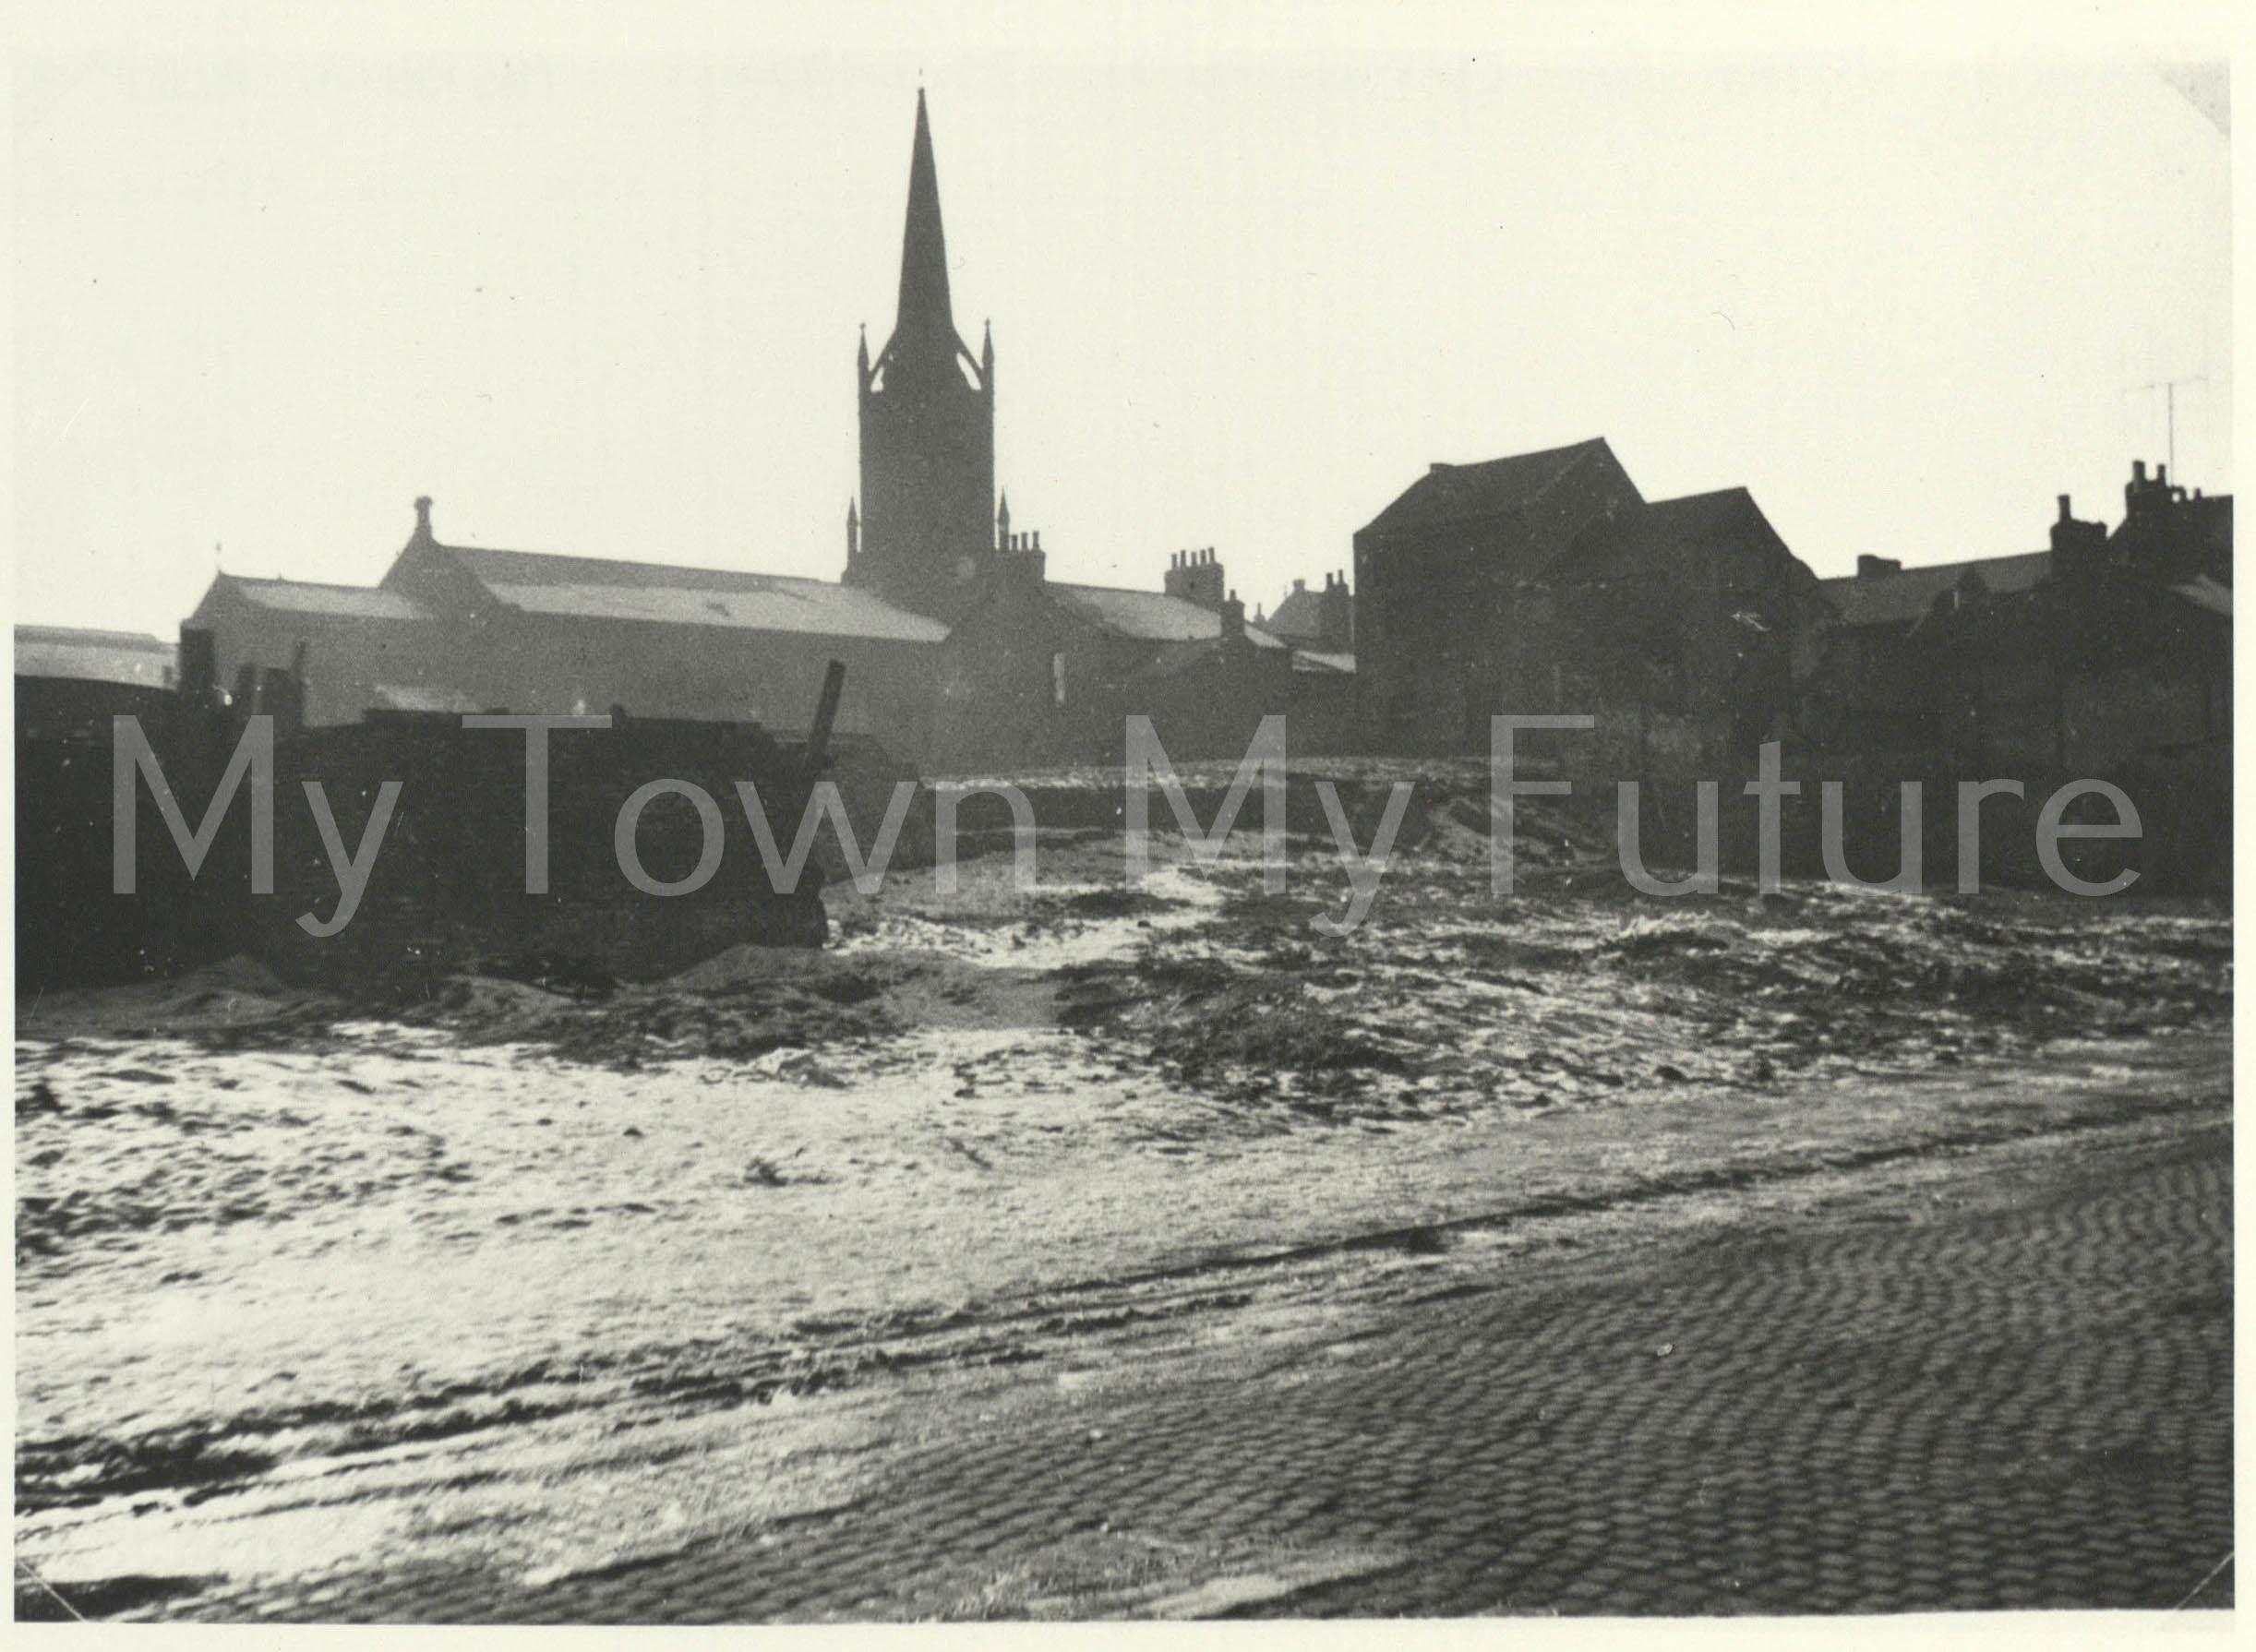 St Hilda's Church, 1955, Dept. of Ec. Dev. & Planning - Cleveland County Council